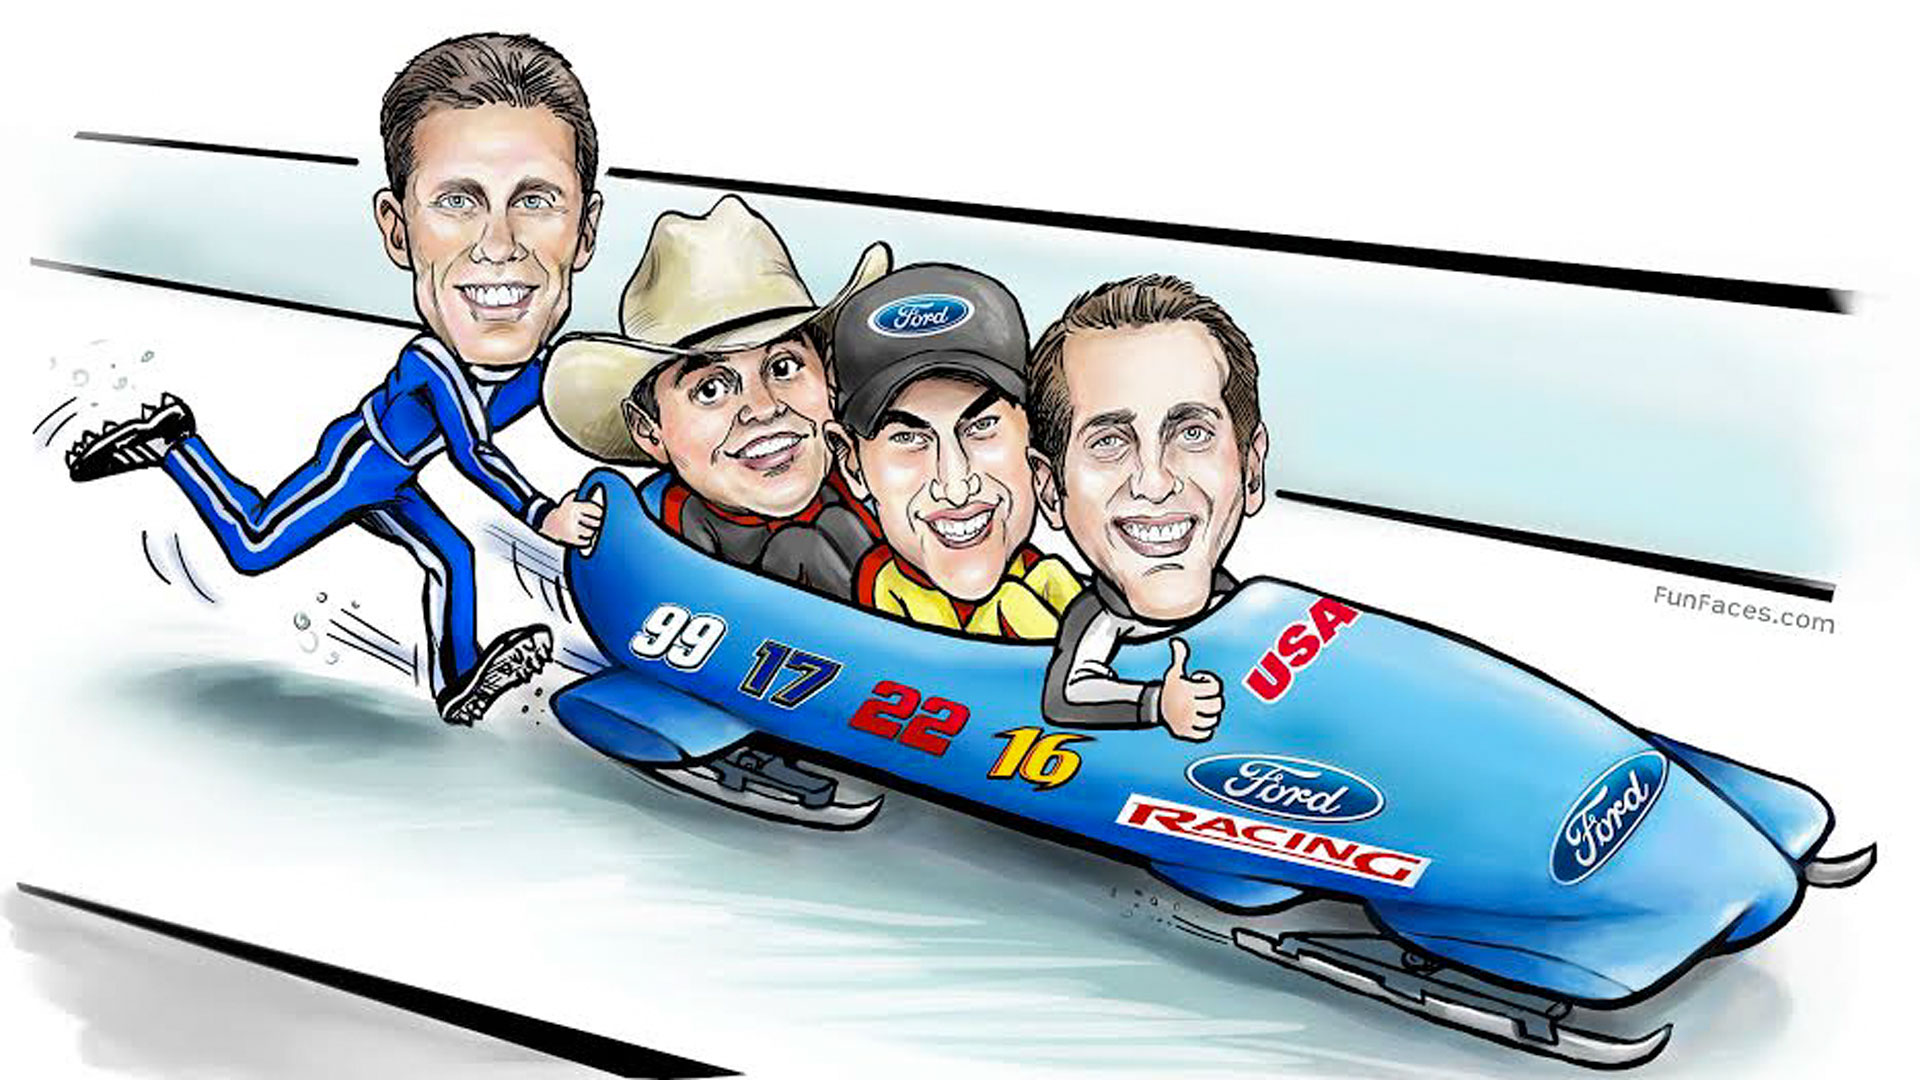 Ford Racing Fun Olympics-020614-FTR.jpg